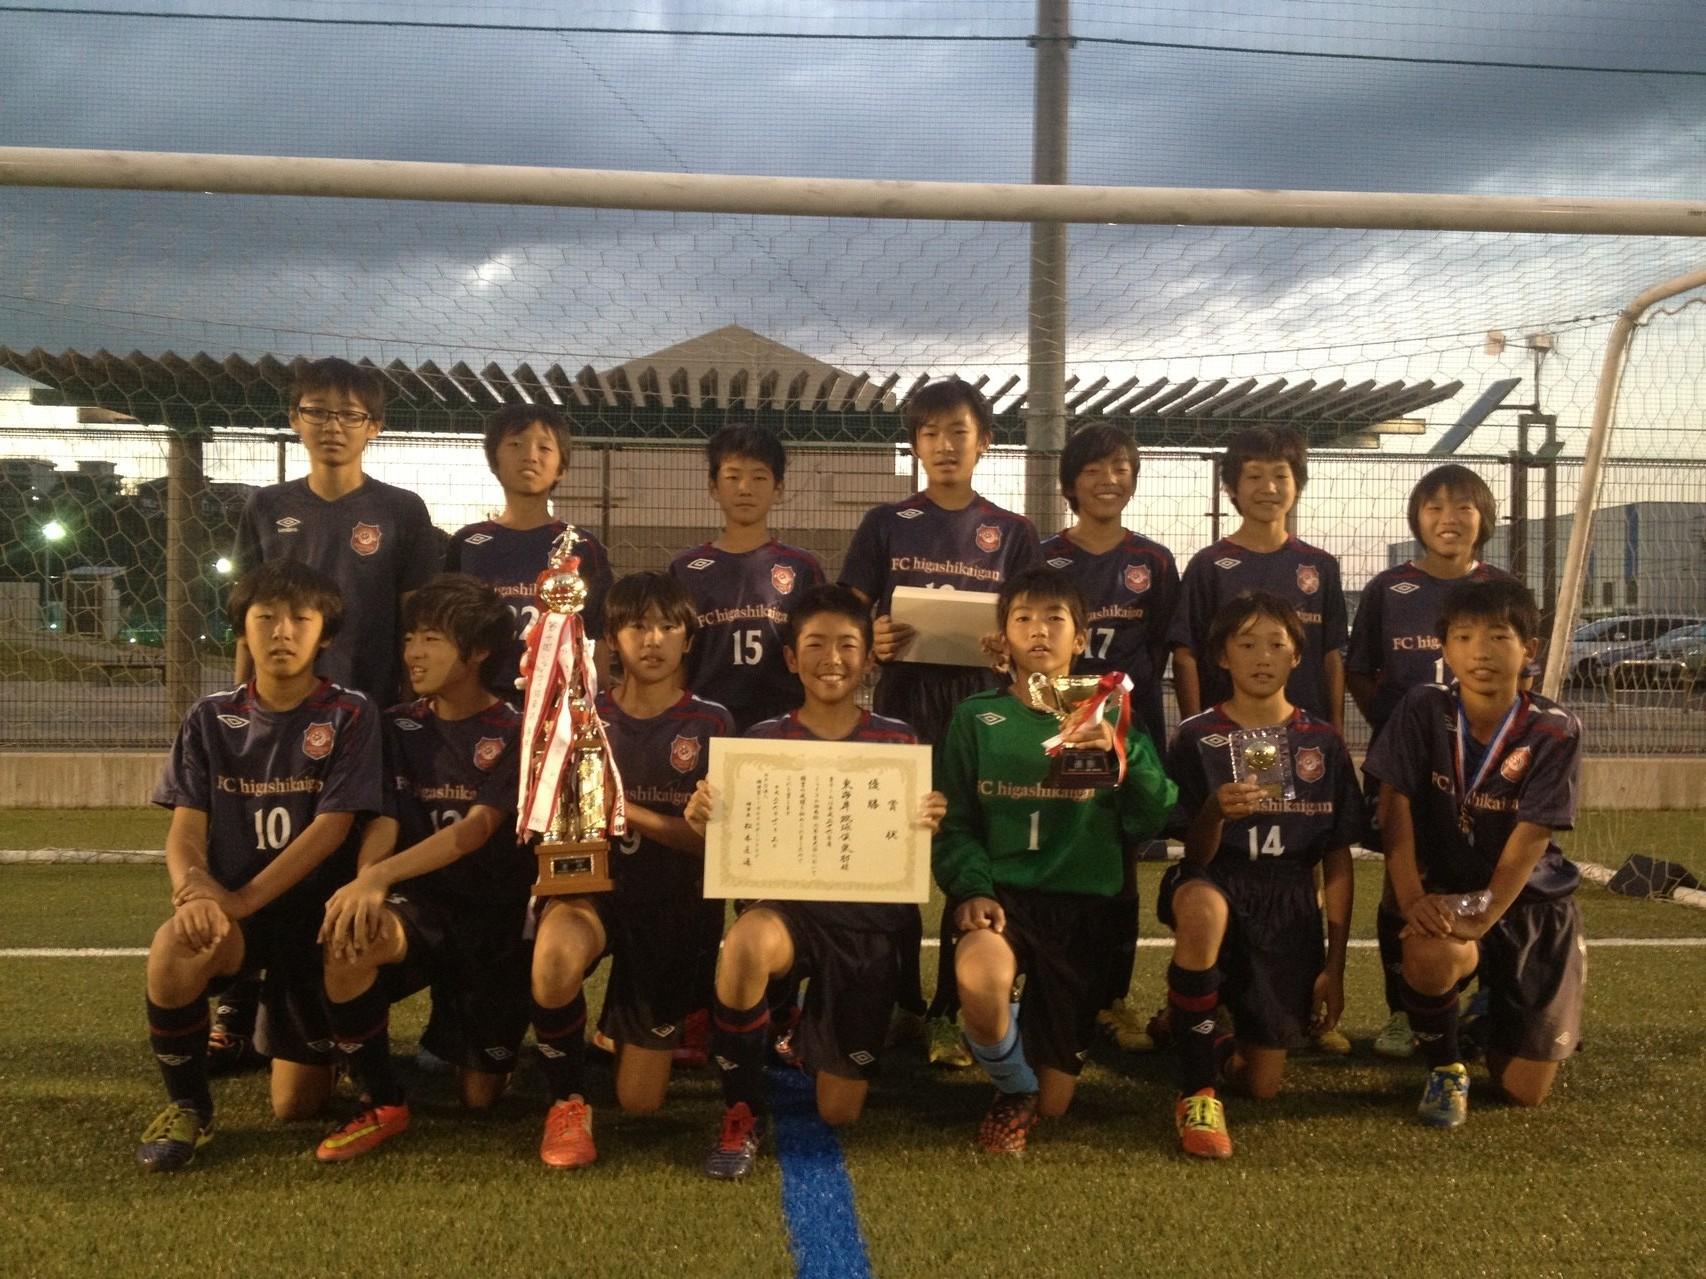 J:COM湘南杯 U-12(6年生) 優勝(東海岸蹴球倶楽部の皆さん)